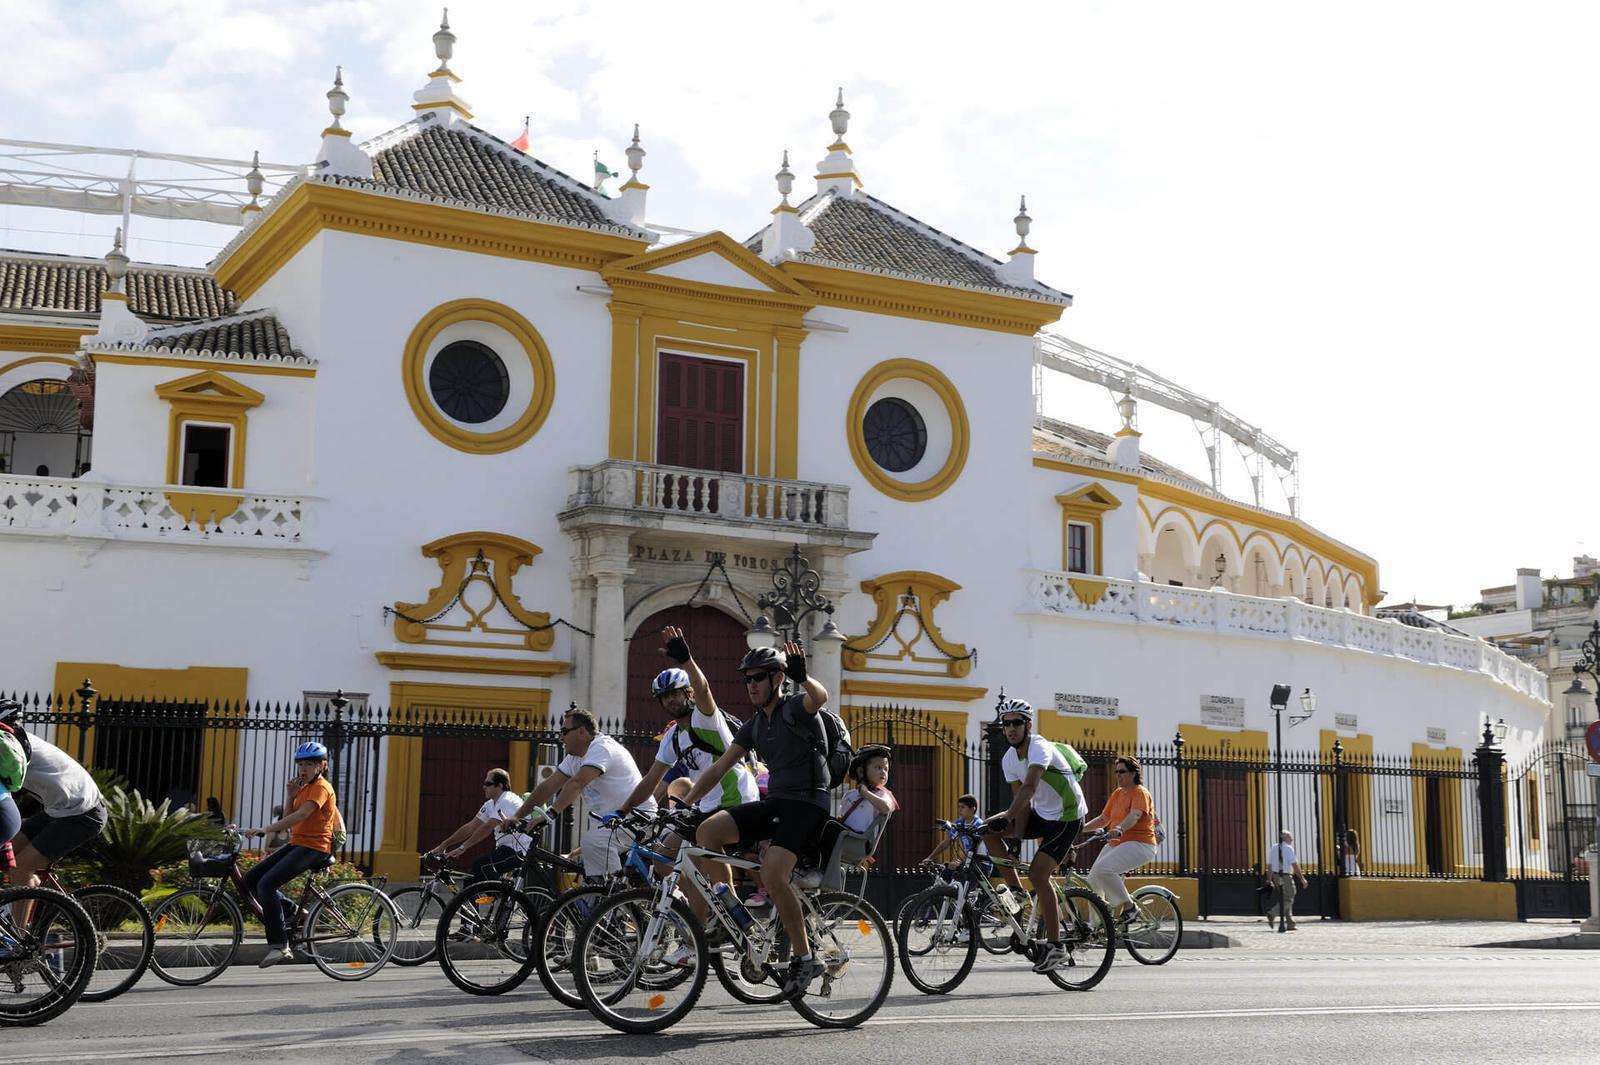 rsz_sevilla_ciudad_tourism3 (1)